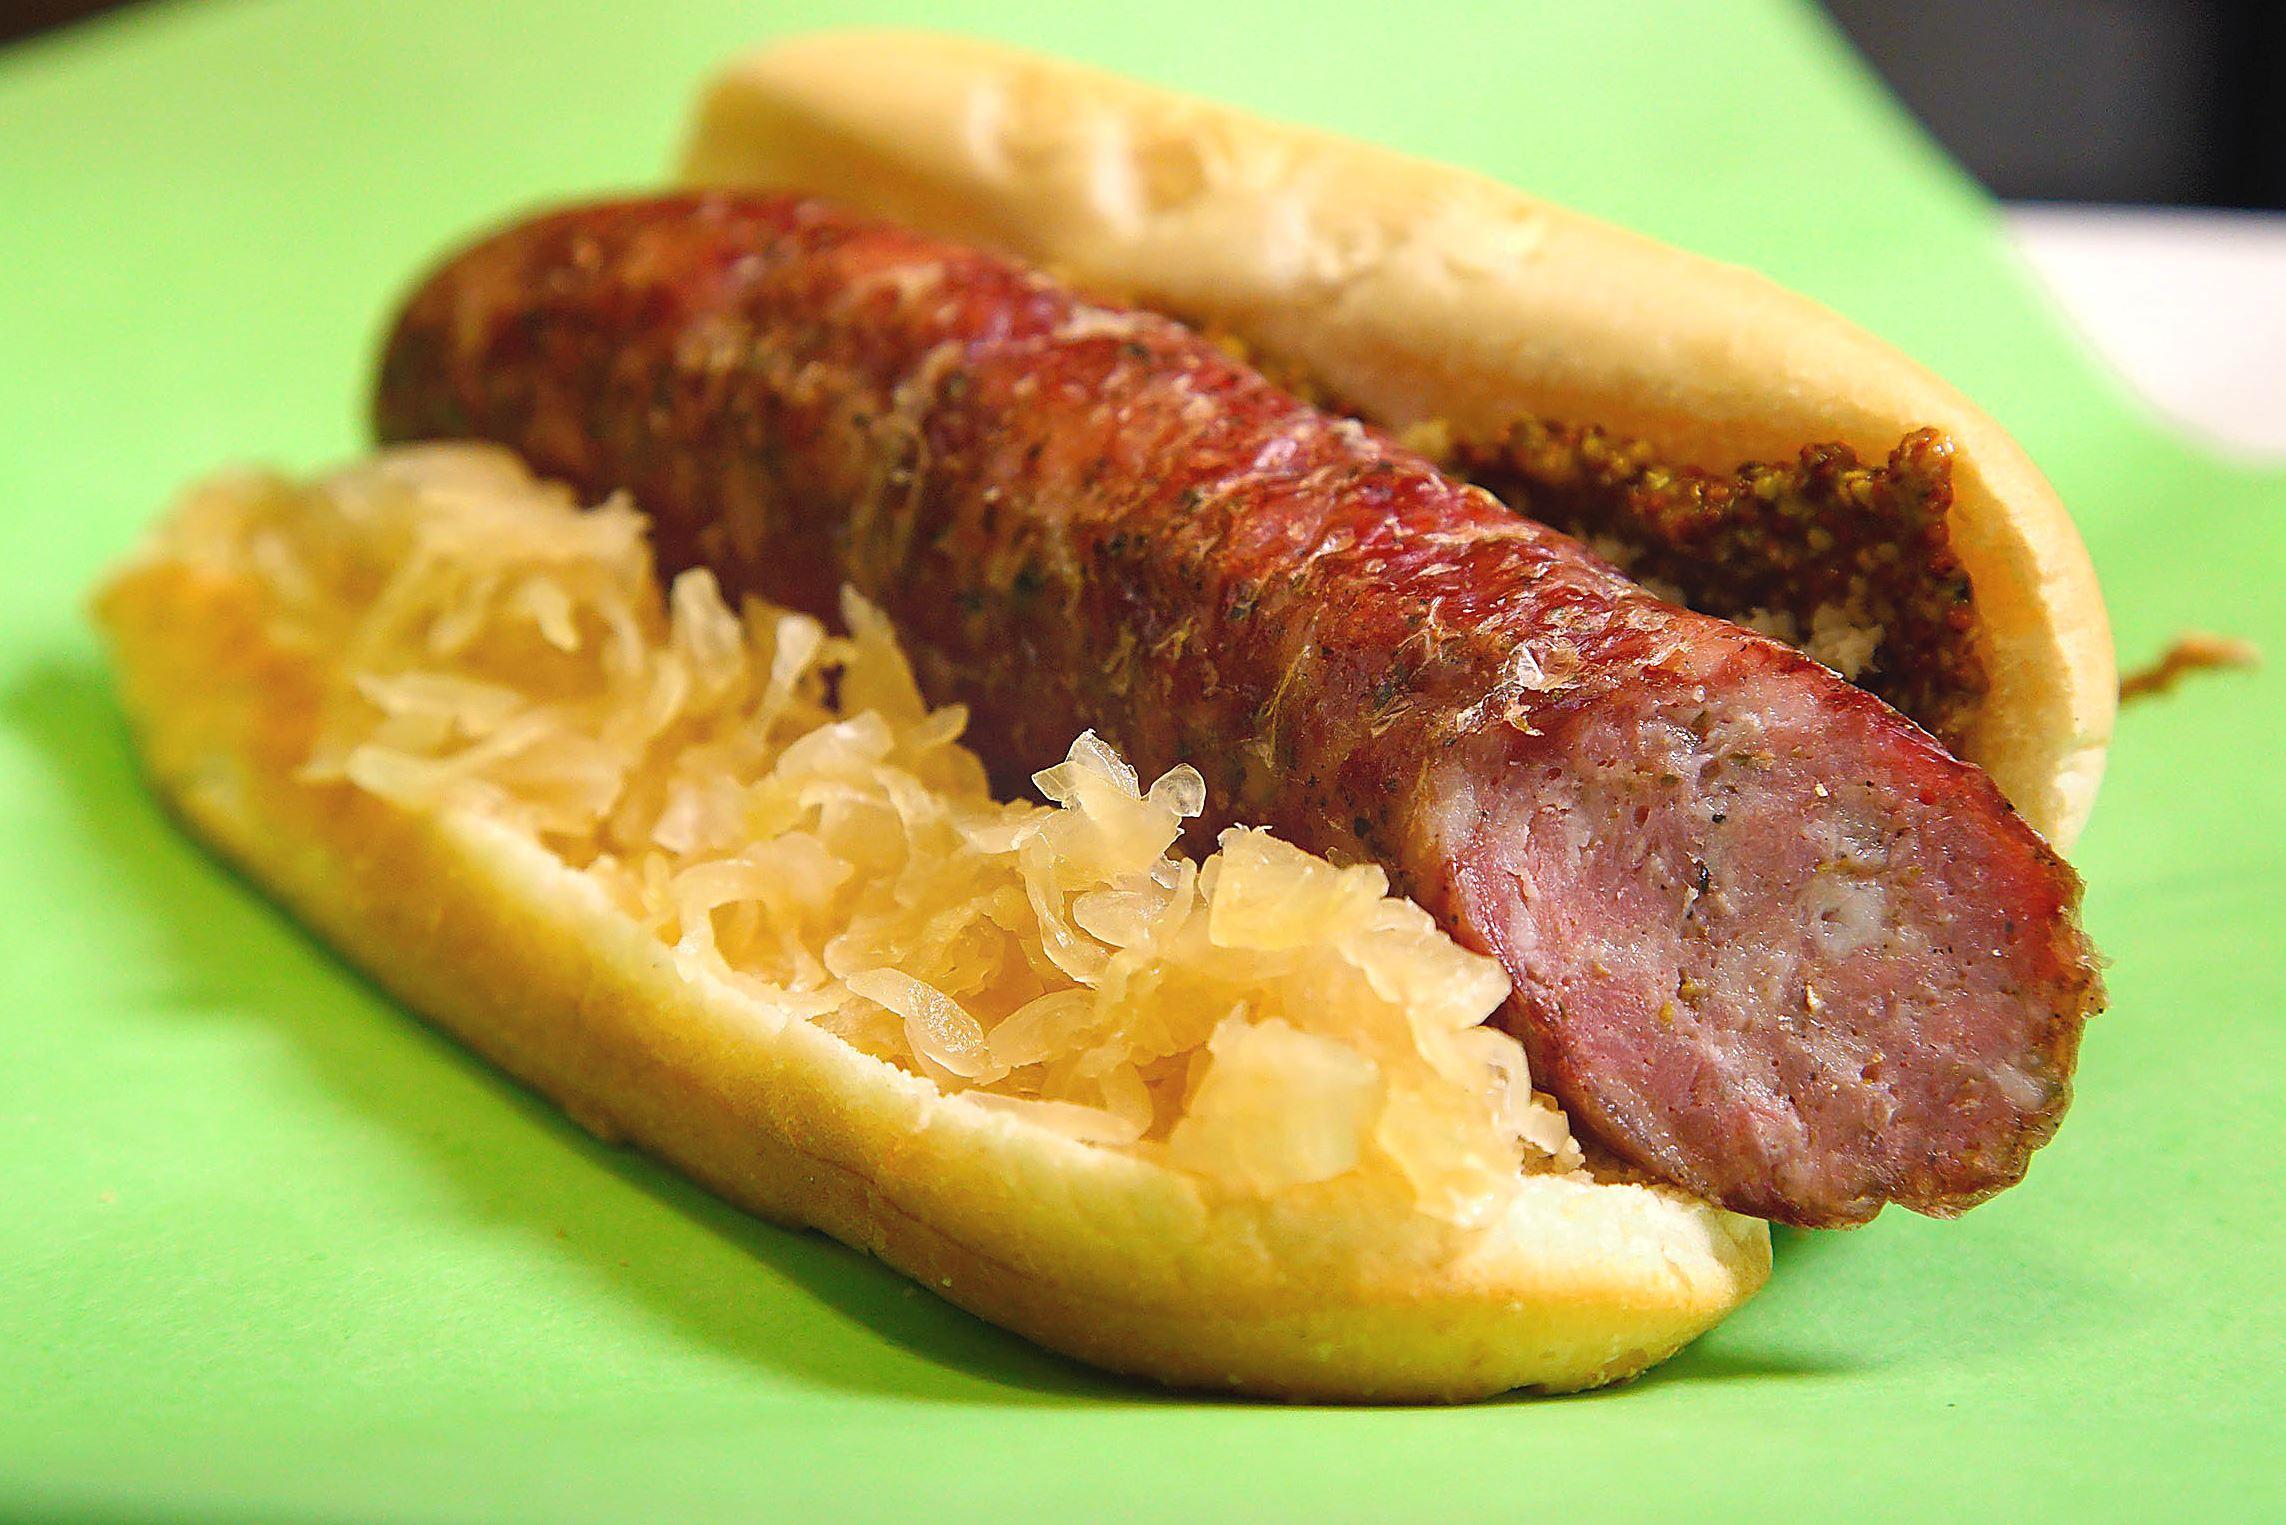 bizarre_butcher_butler_kielbasa Butcher on Butler's kielbasa is served with horseradish, Dijon mustard and sauerkraut.